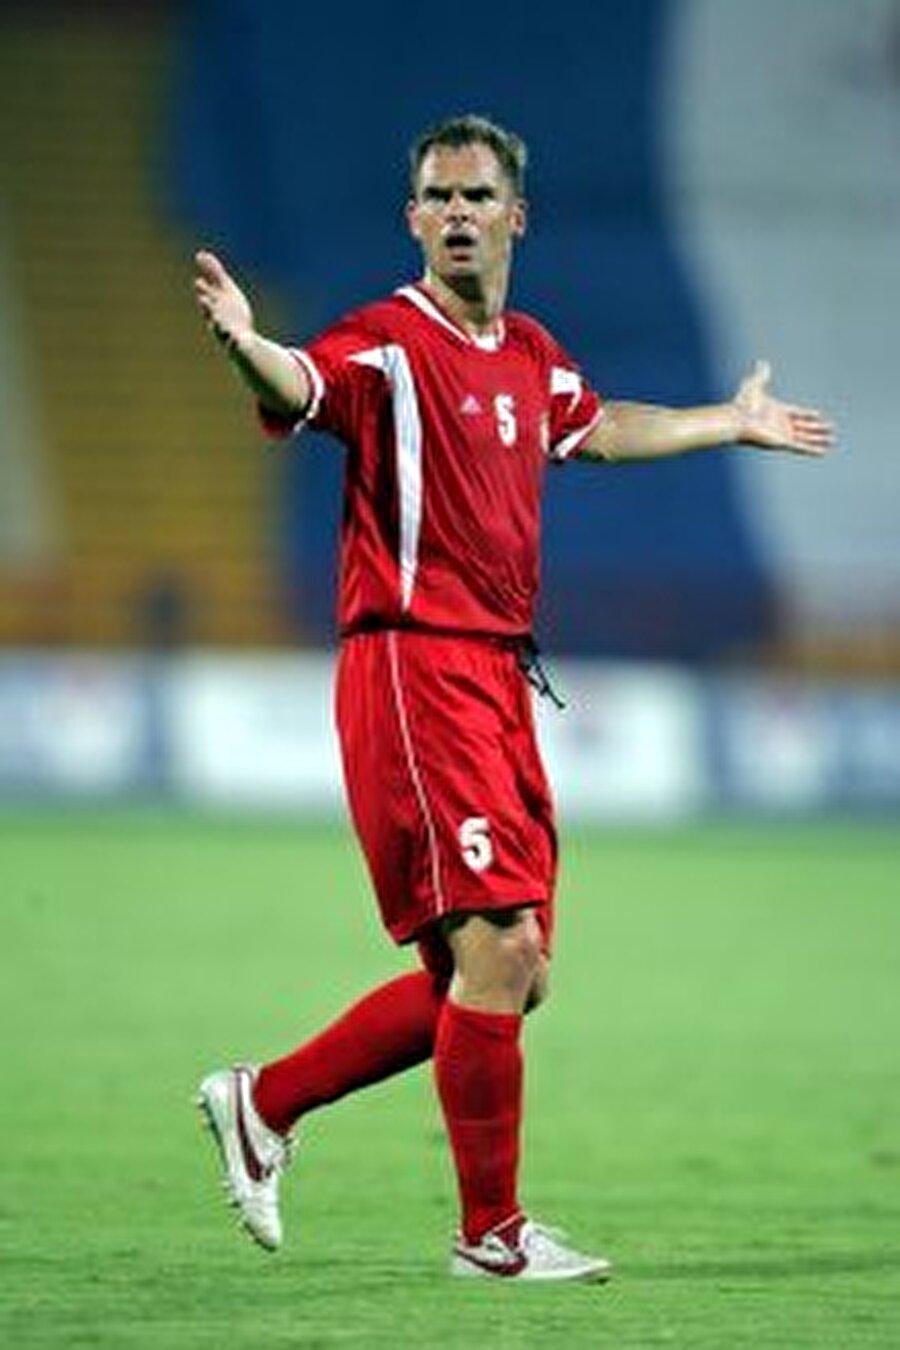 Ronald De Boer Hollandalı futbolcu 2004'te Glasgow Rangers'tan Al Rayyan'a transfer oldu.